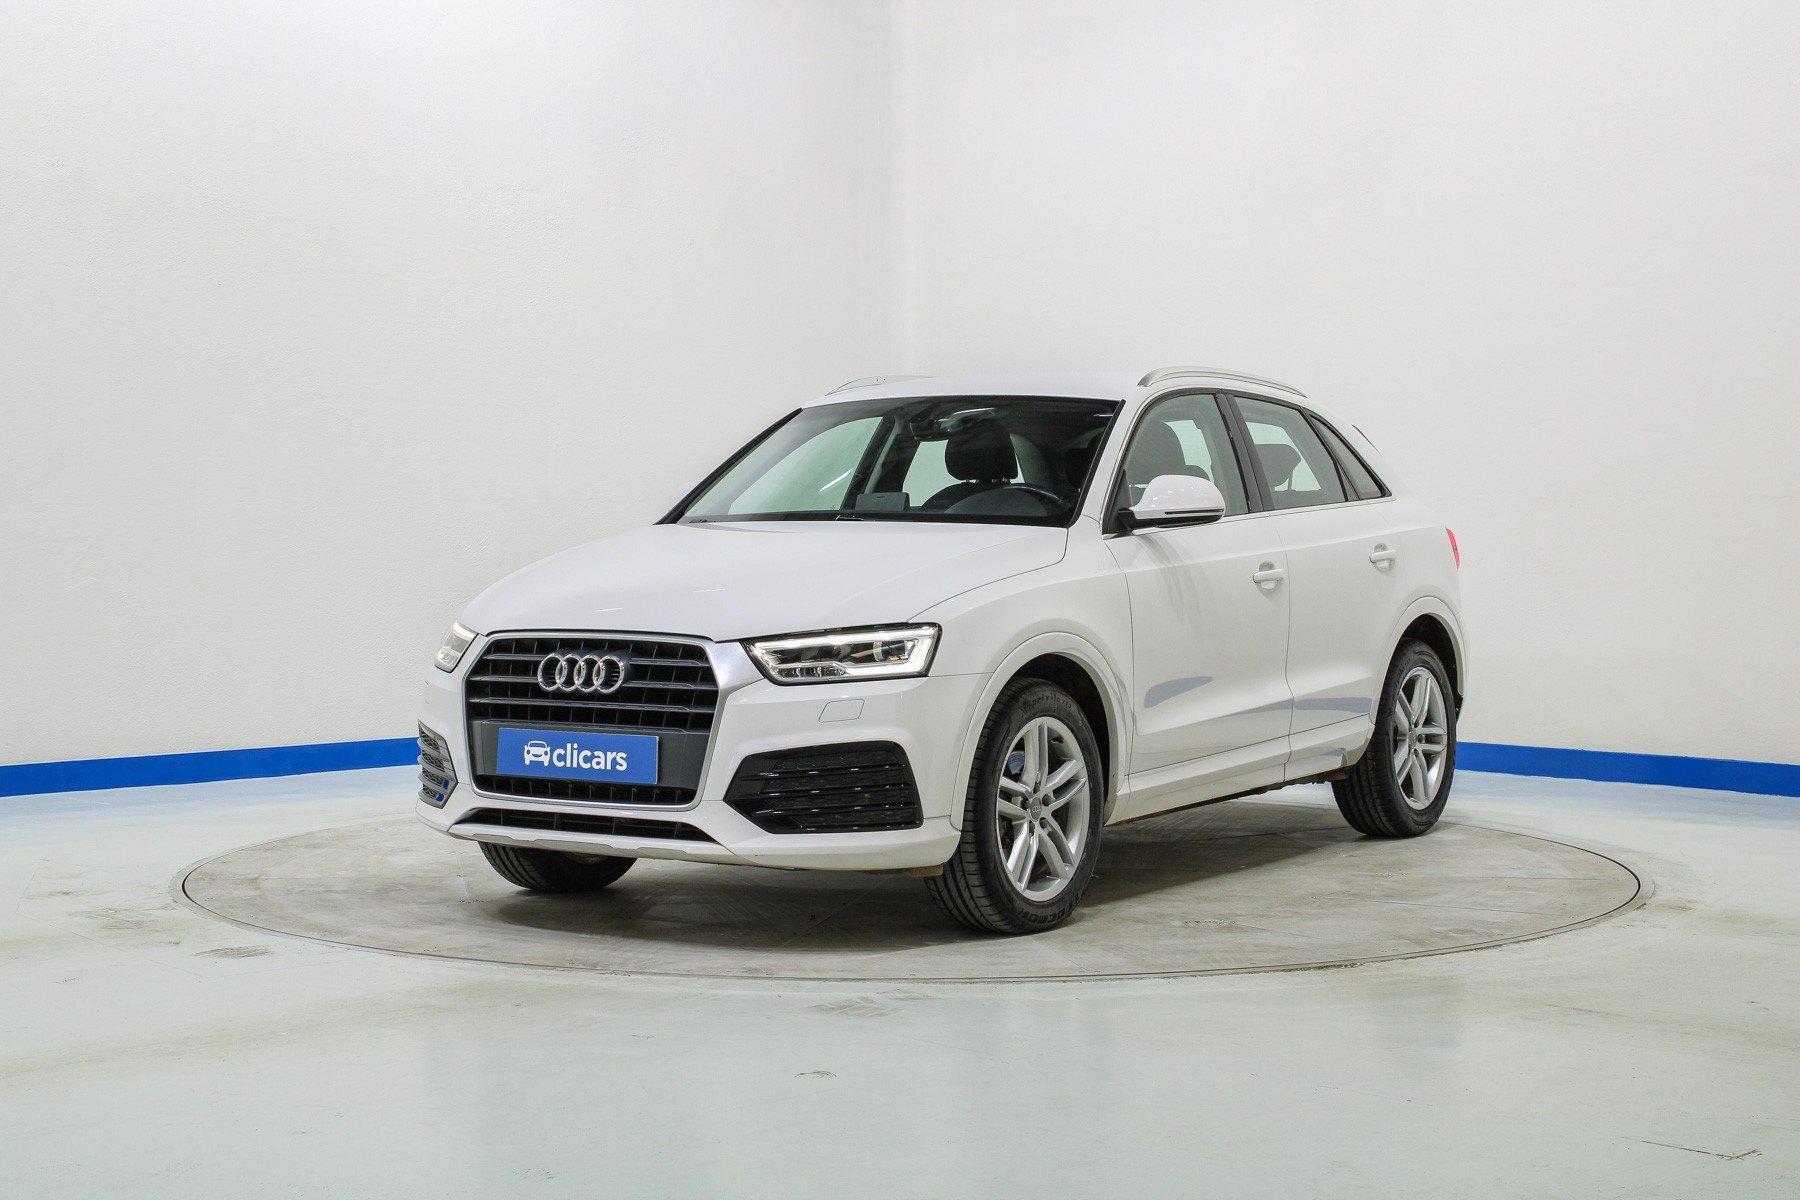 Audi Q3 Diésel Sport edition 2.0 TDI 110kW (150CV) 1